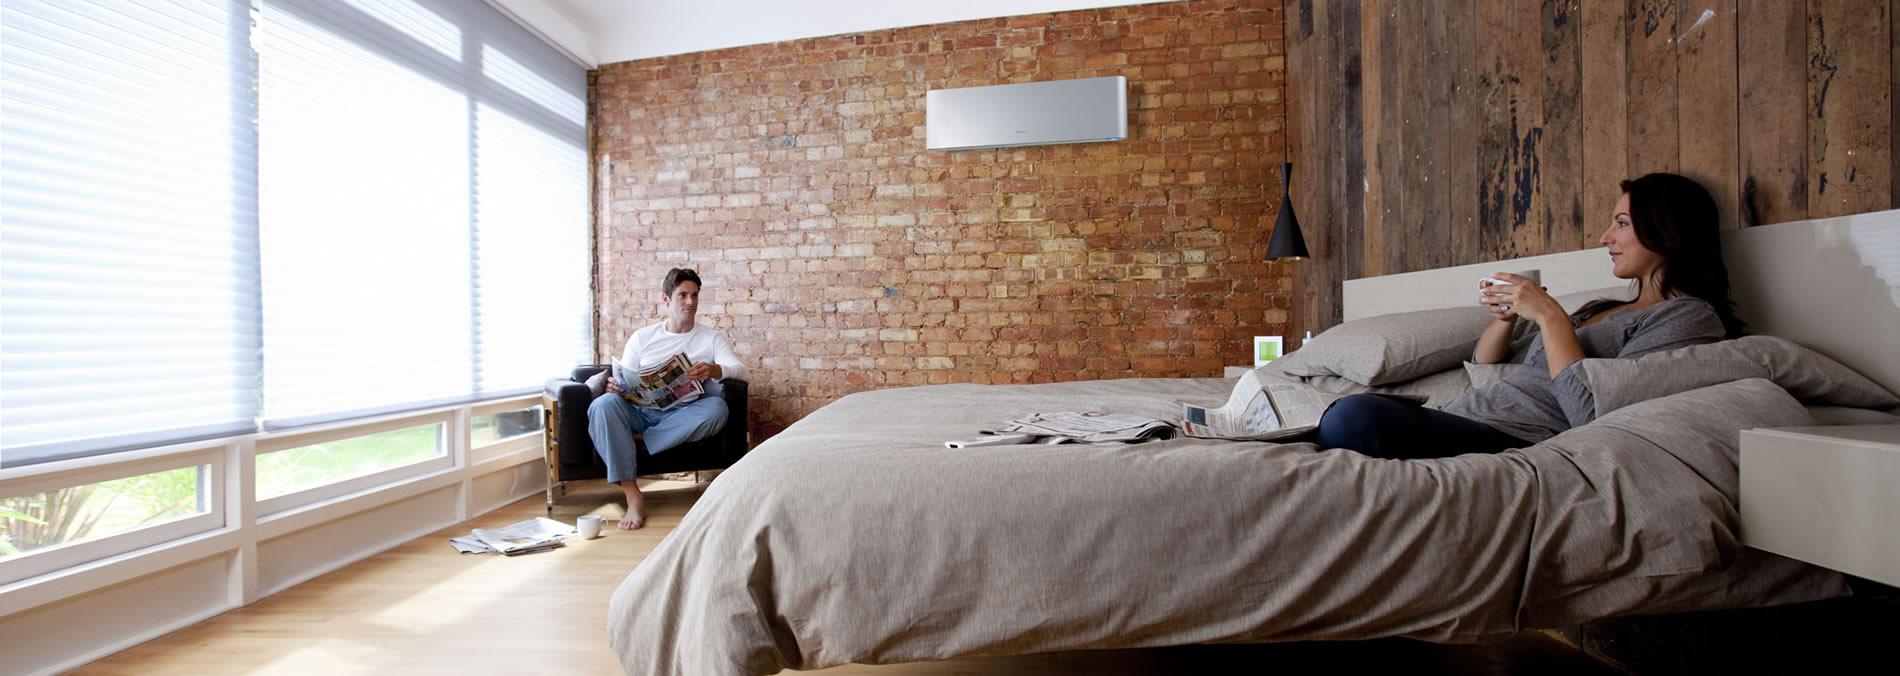 daikin-emura-in-bedroom